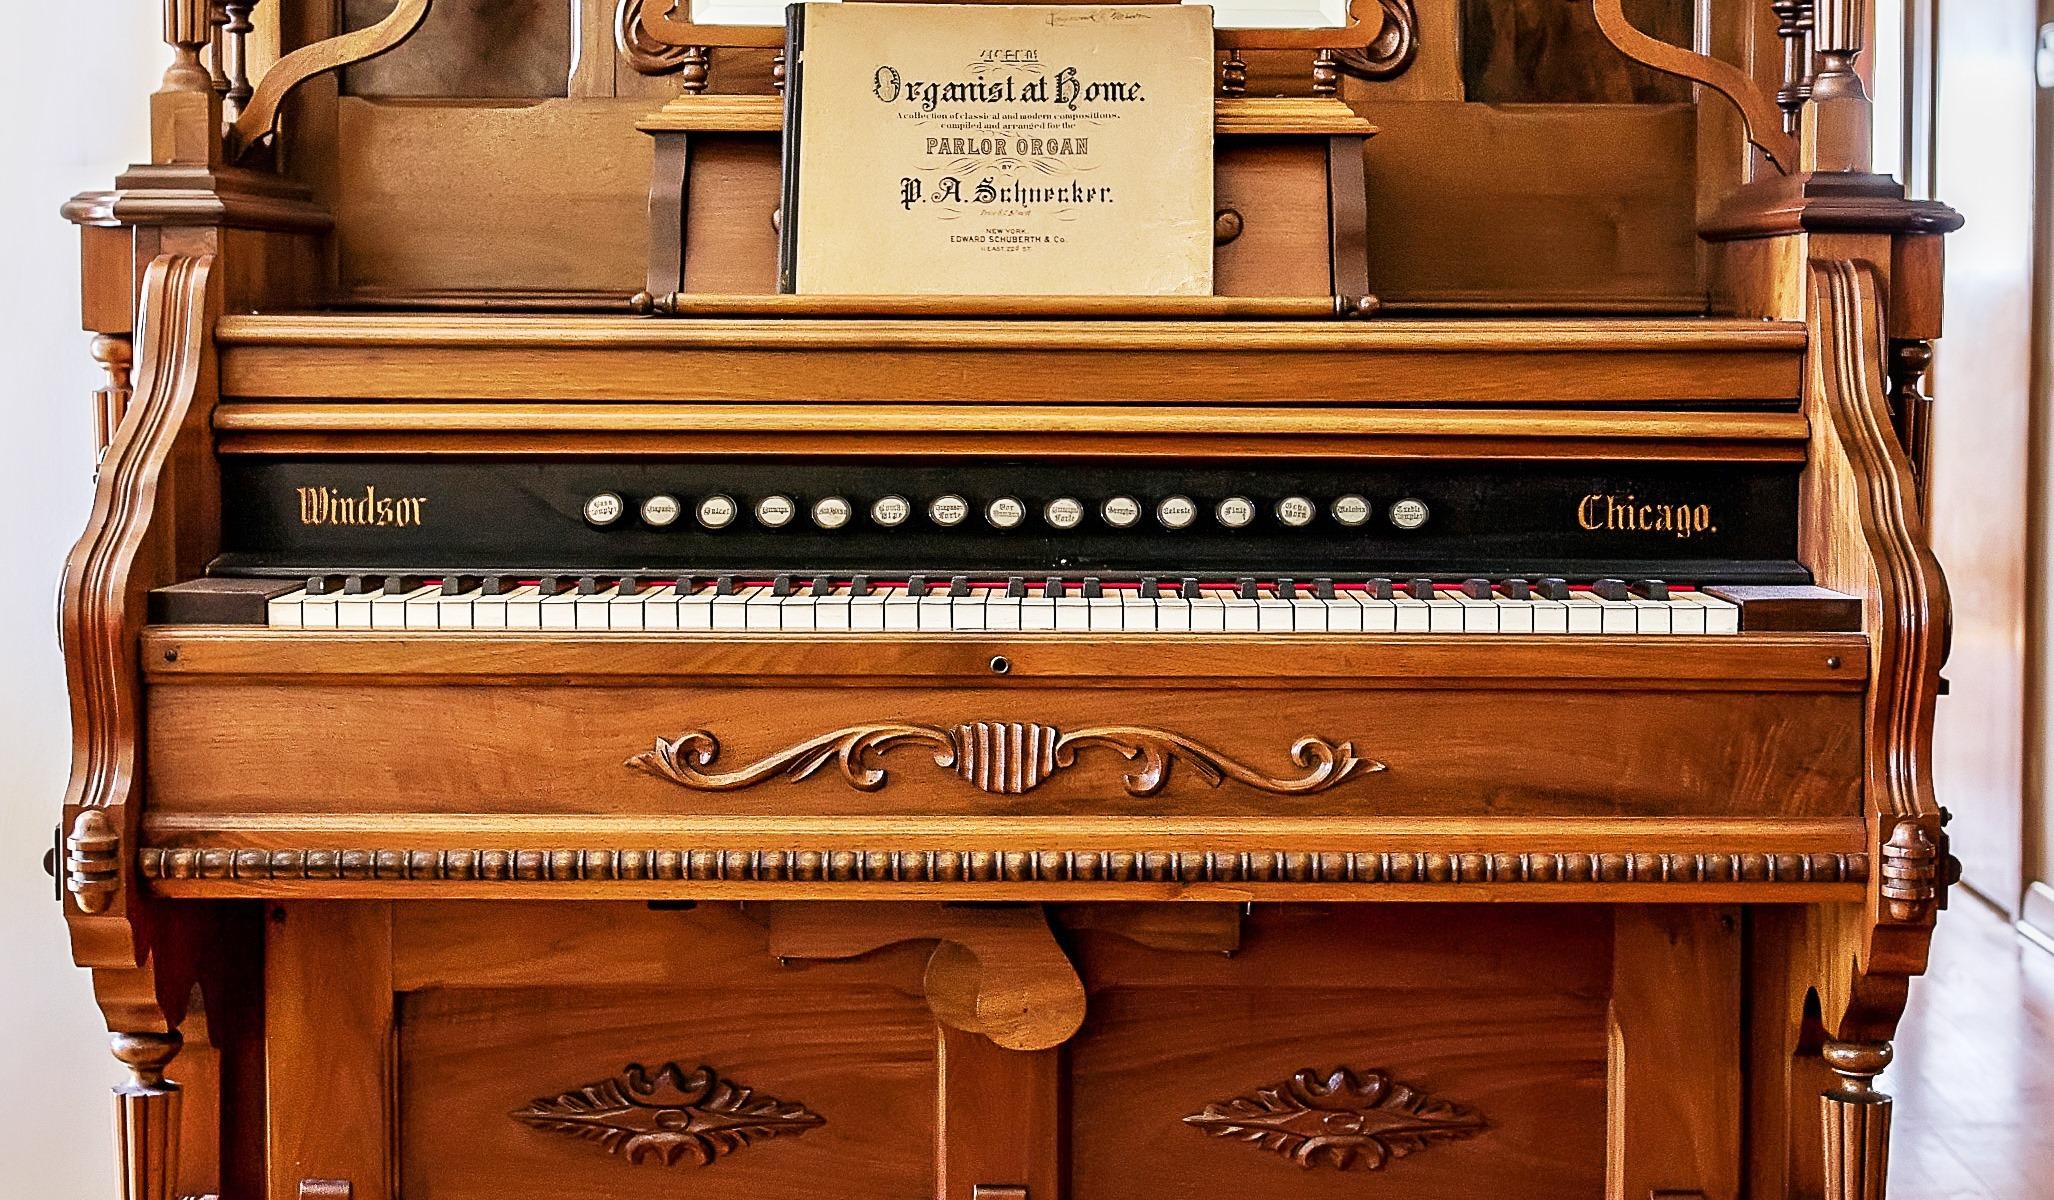 reed+organ